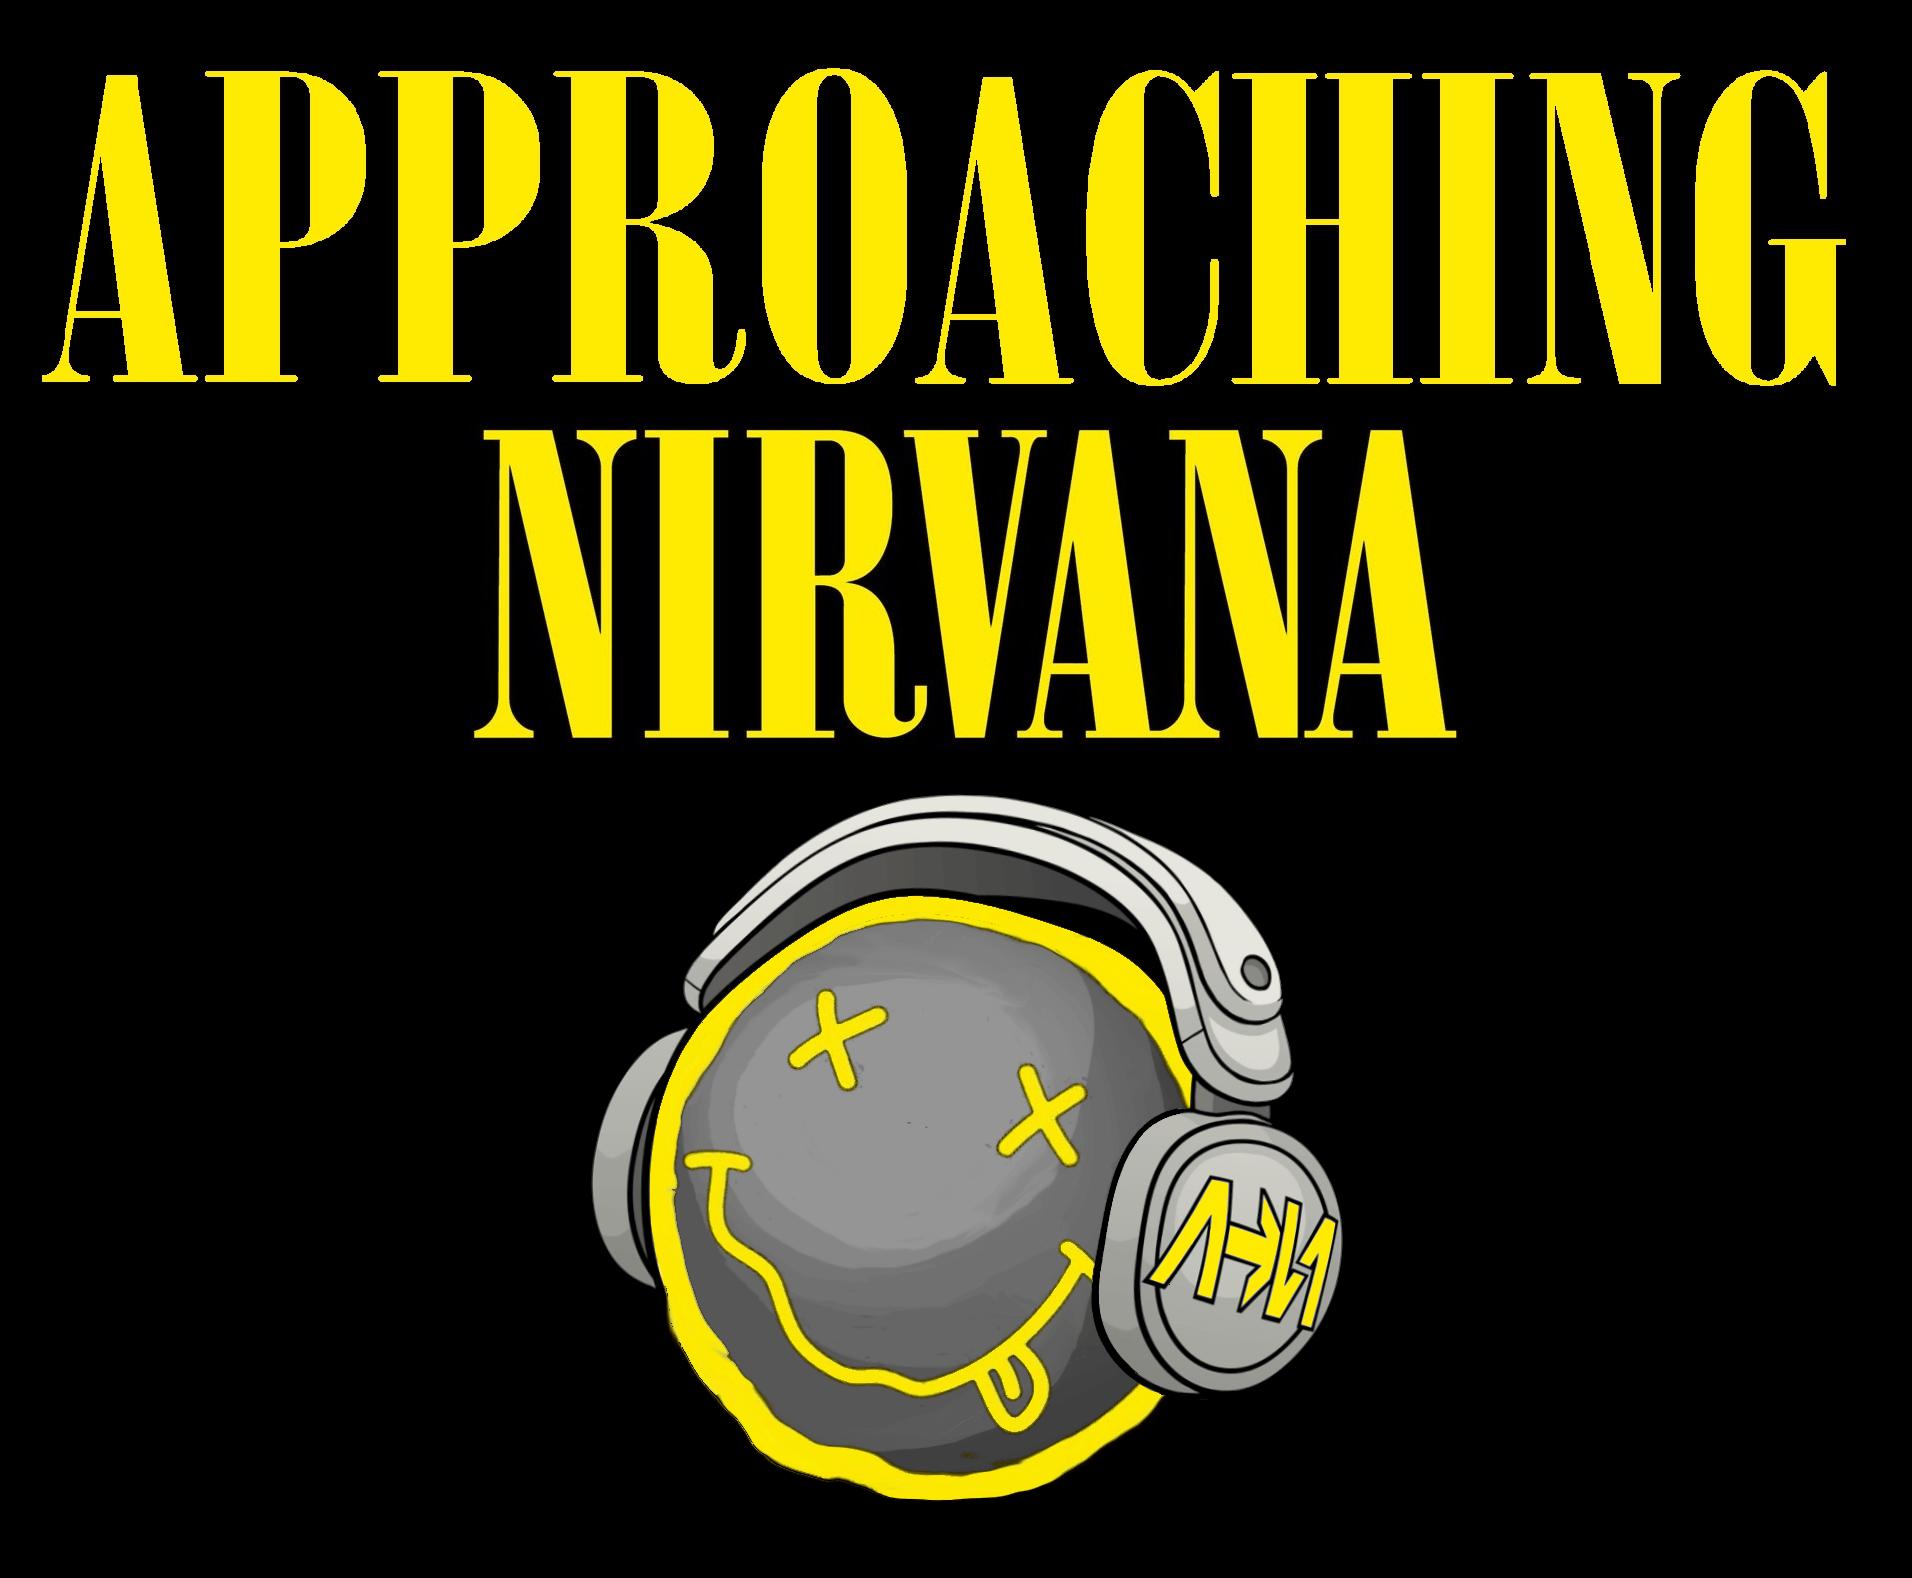 nirvanq